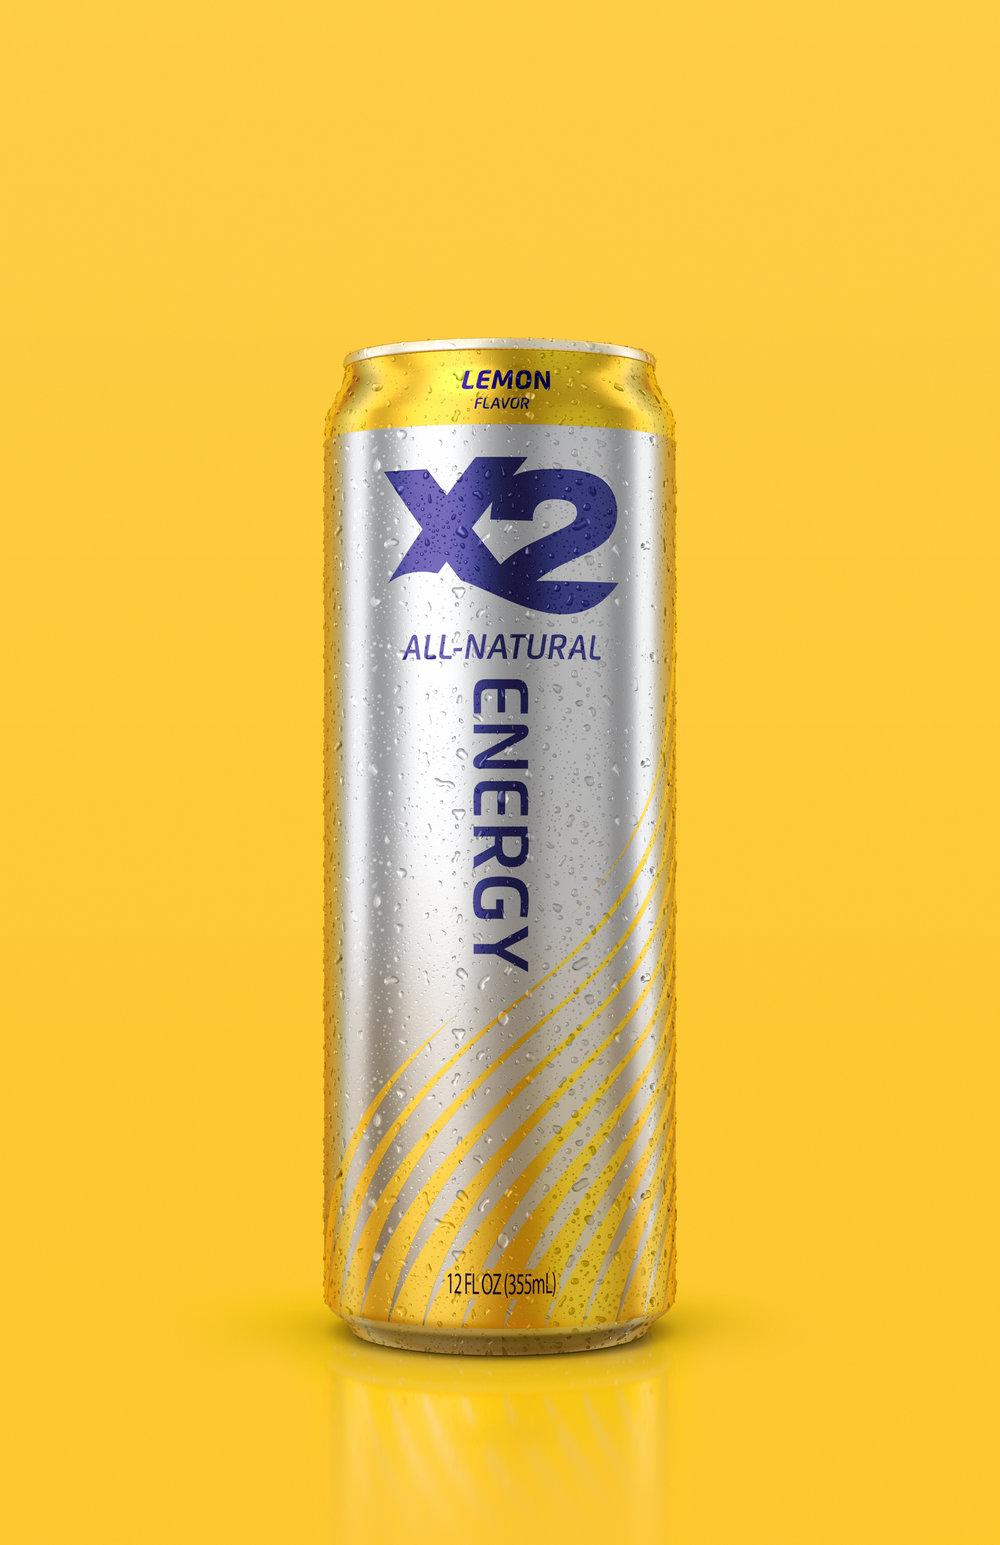 180425_CHASE_X2_ENERGY_CAN_LMON_HR_LV.jpg